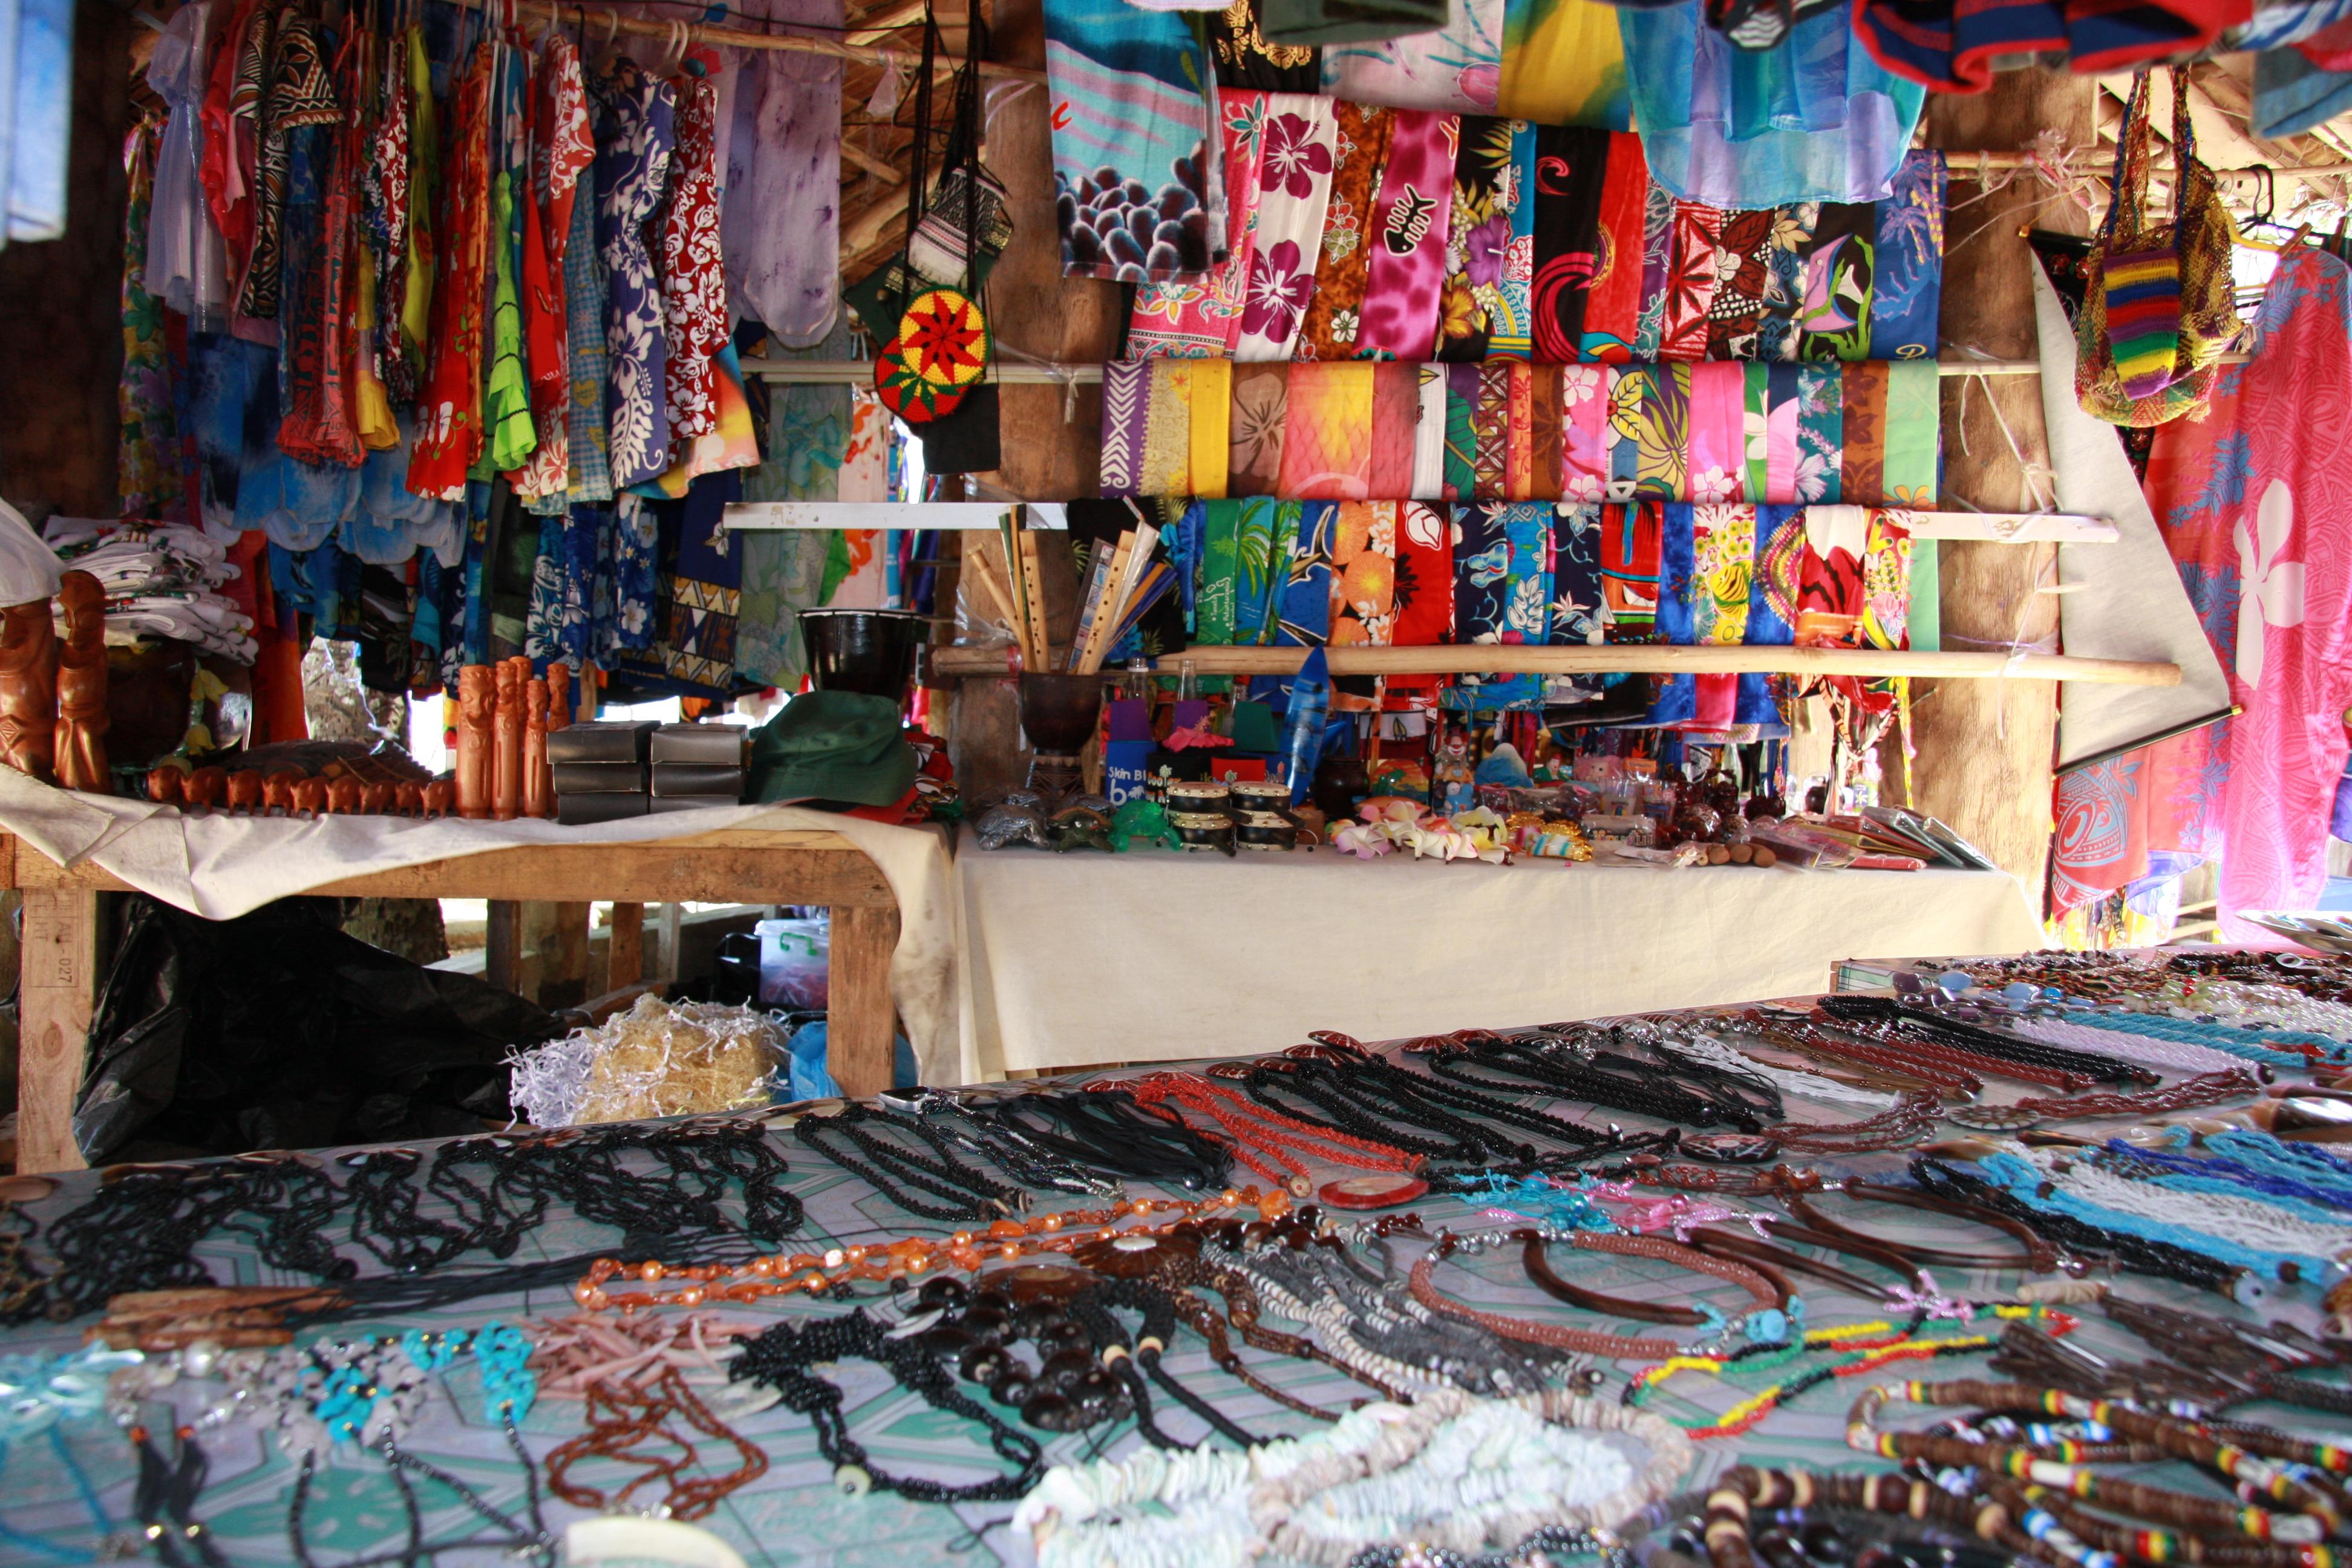 File:Handicraft market, Port Vila, Vanuatu 2009. Photo- Cindy ...